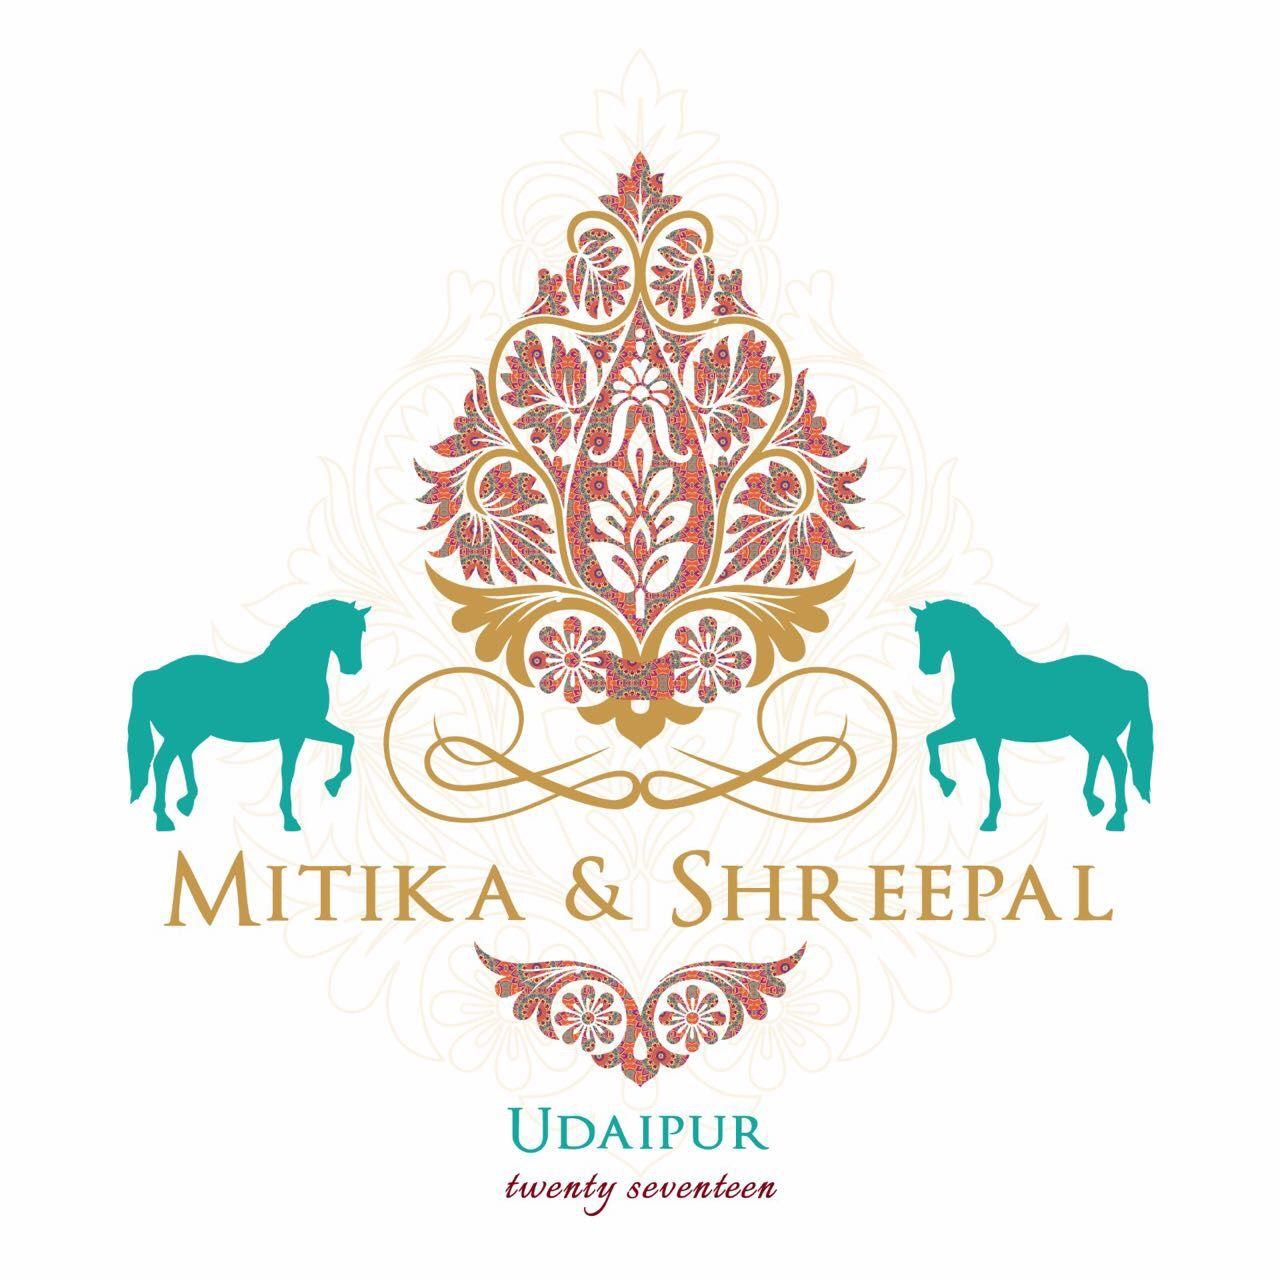 Free Online Indian Wedding Invitation Website: Logo, Wedding Logo, Monogram, Wedding Invitation Cards